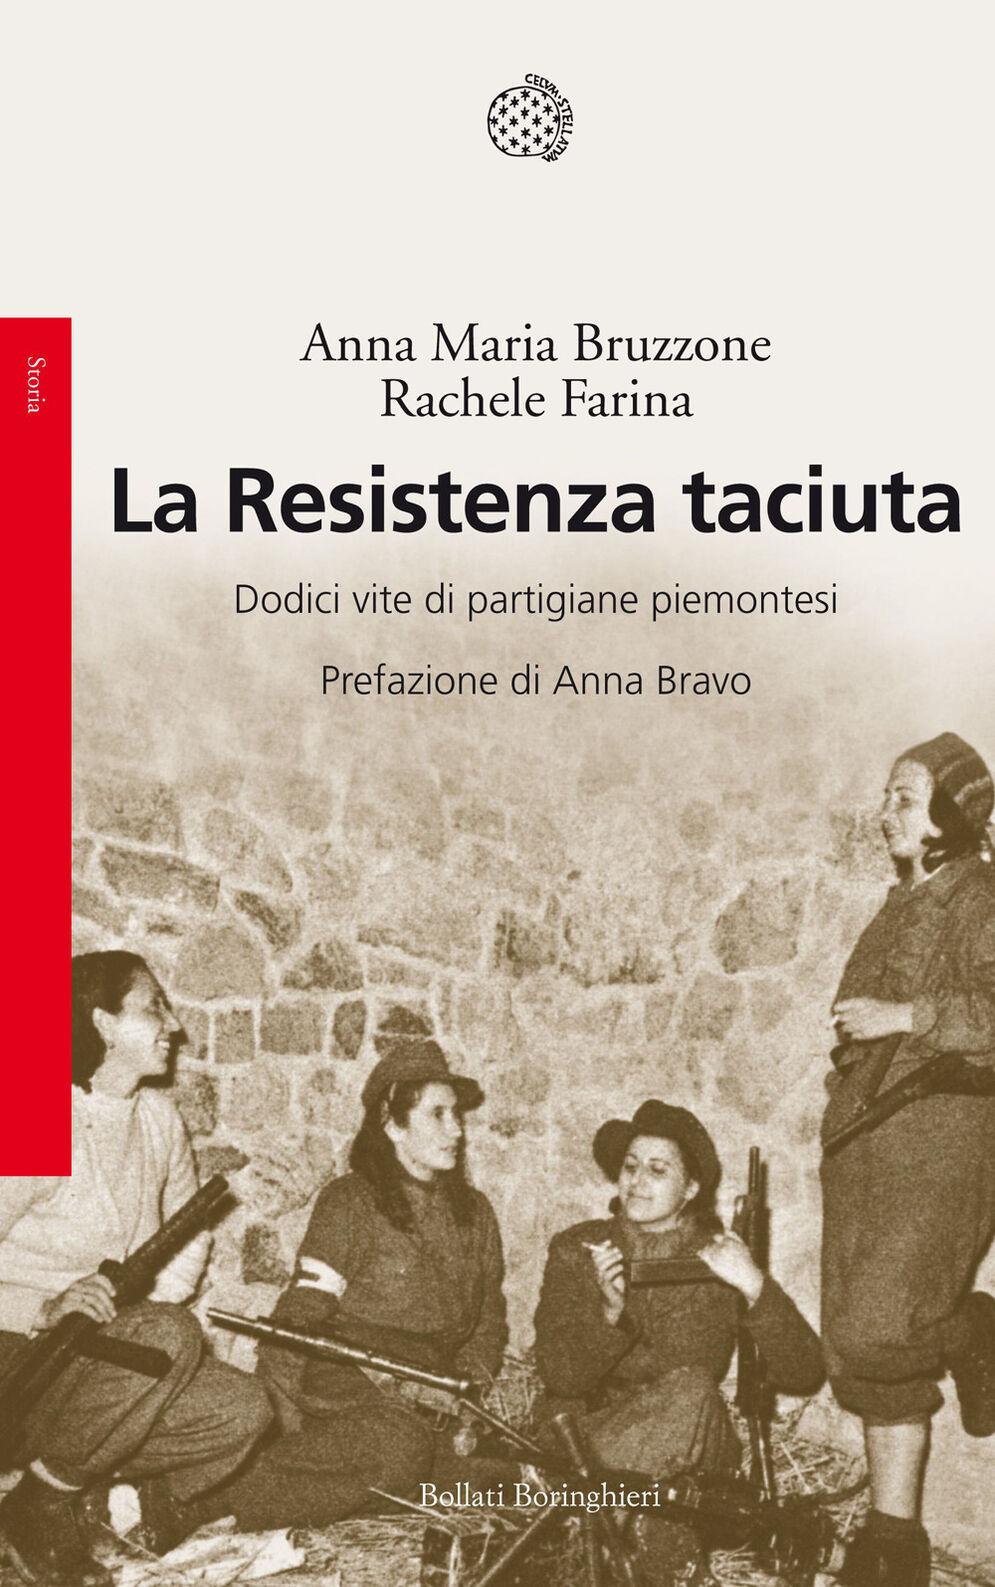 La Resistenza taciuta. Dodici vite di partigiane piemontesi